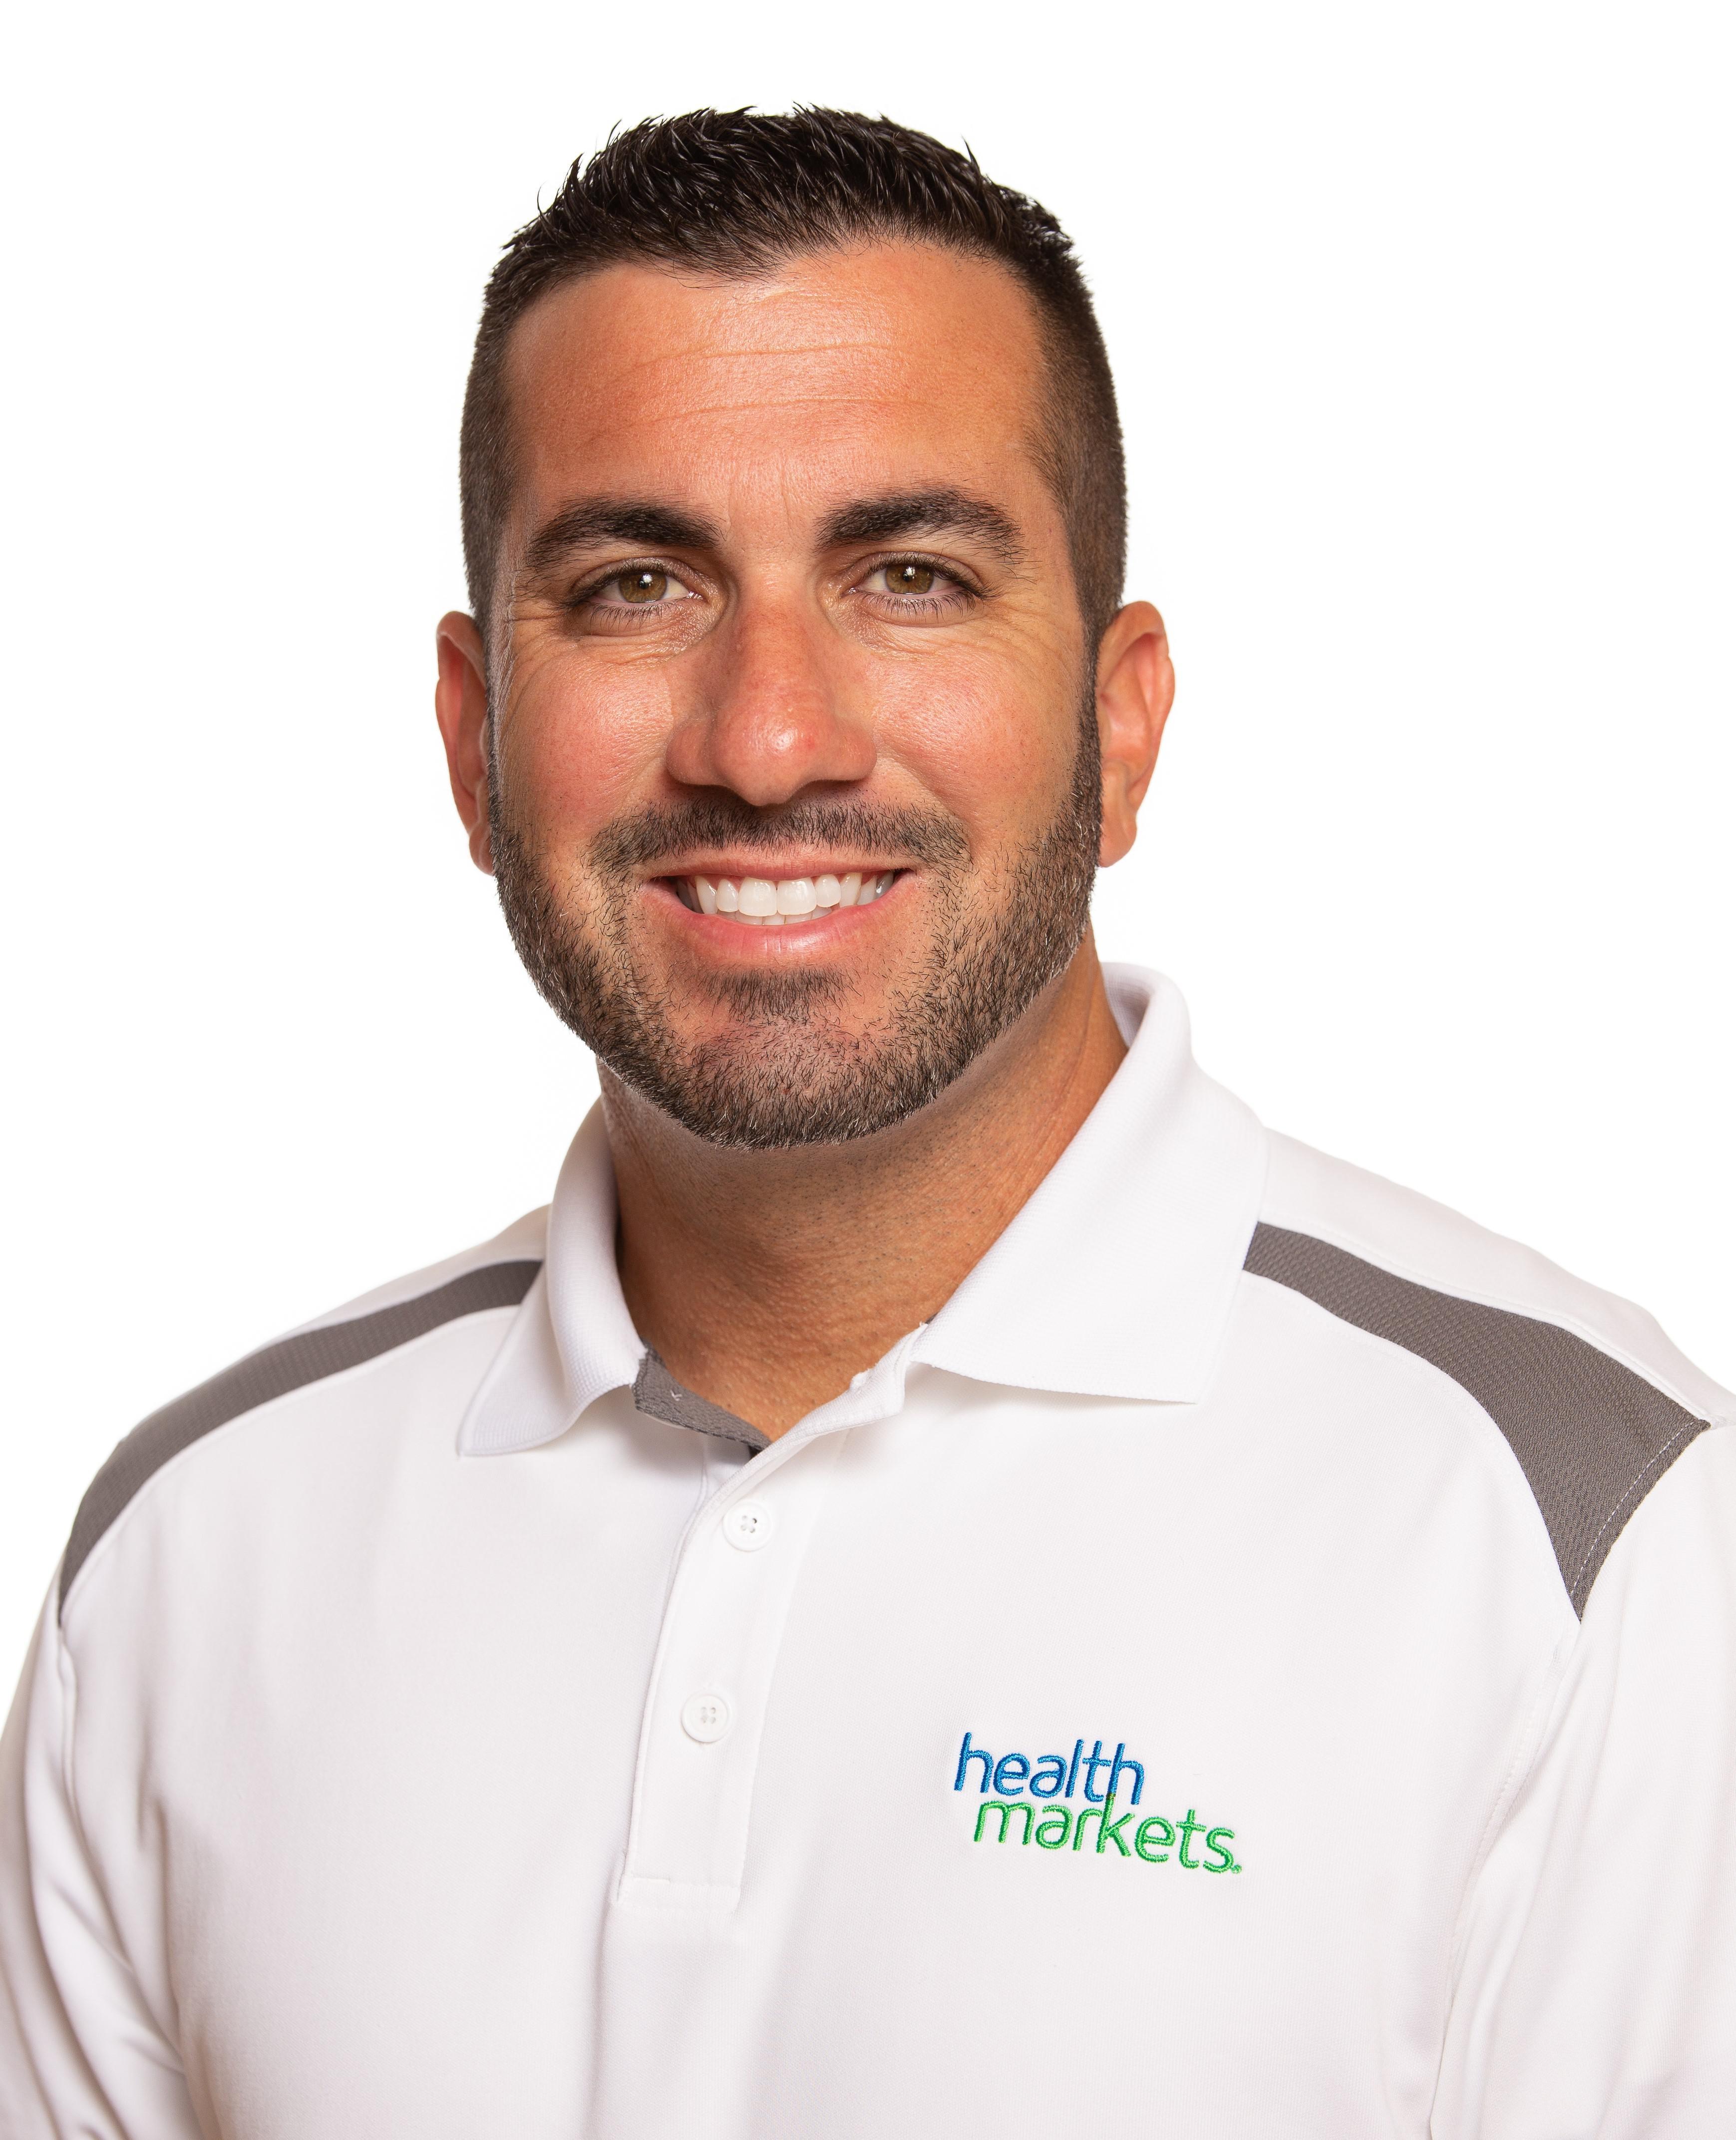 HealthMarkets Insurance - Giorgio Vescera image 0